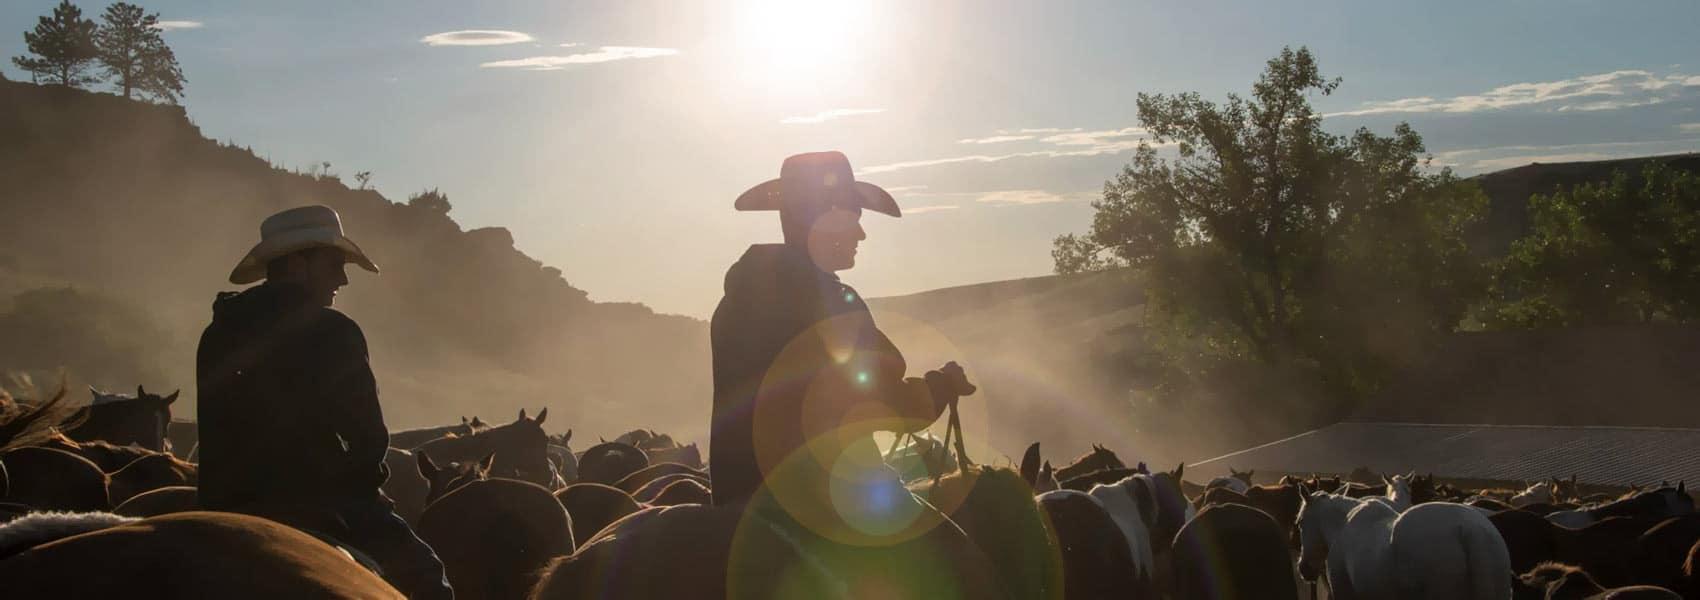 Wranglers hearding horses